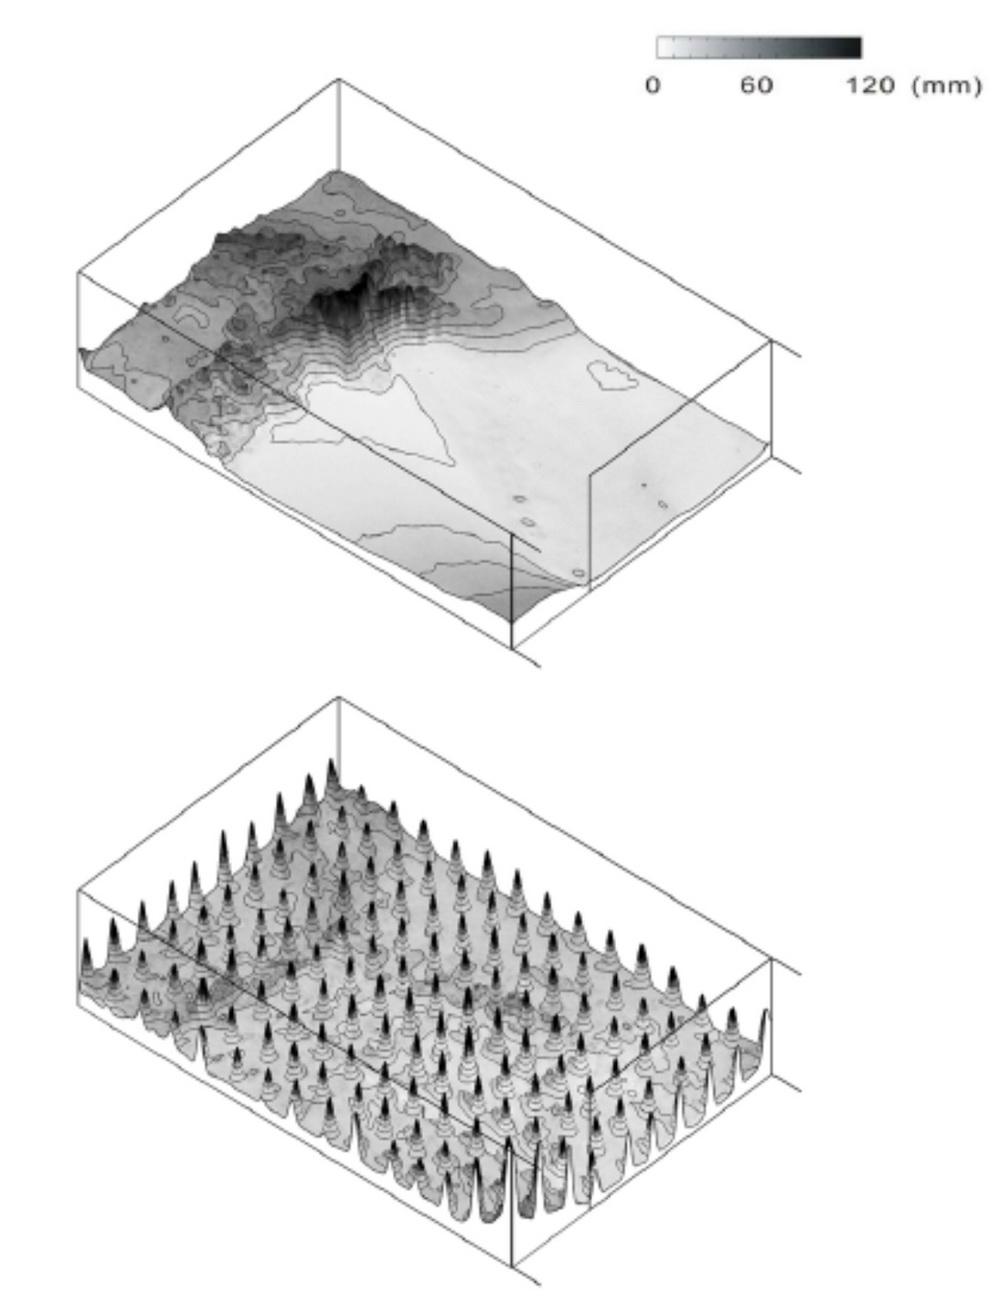 experimental thesis of civil engineering